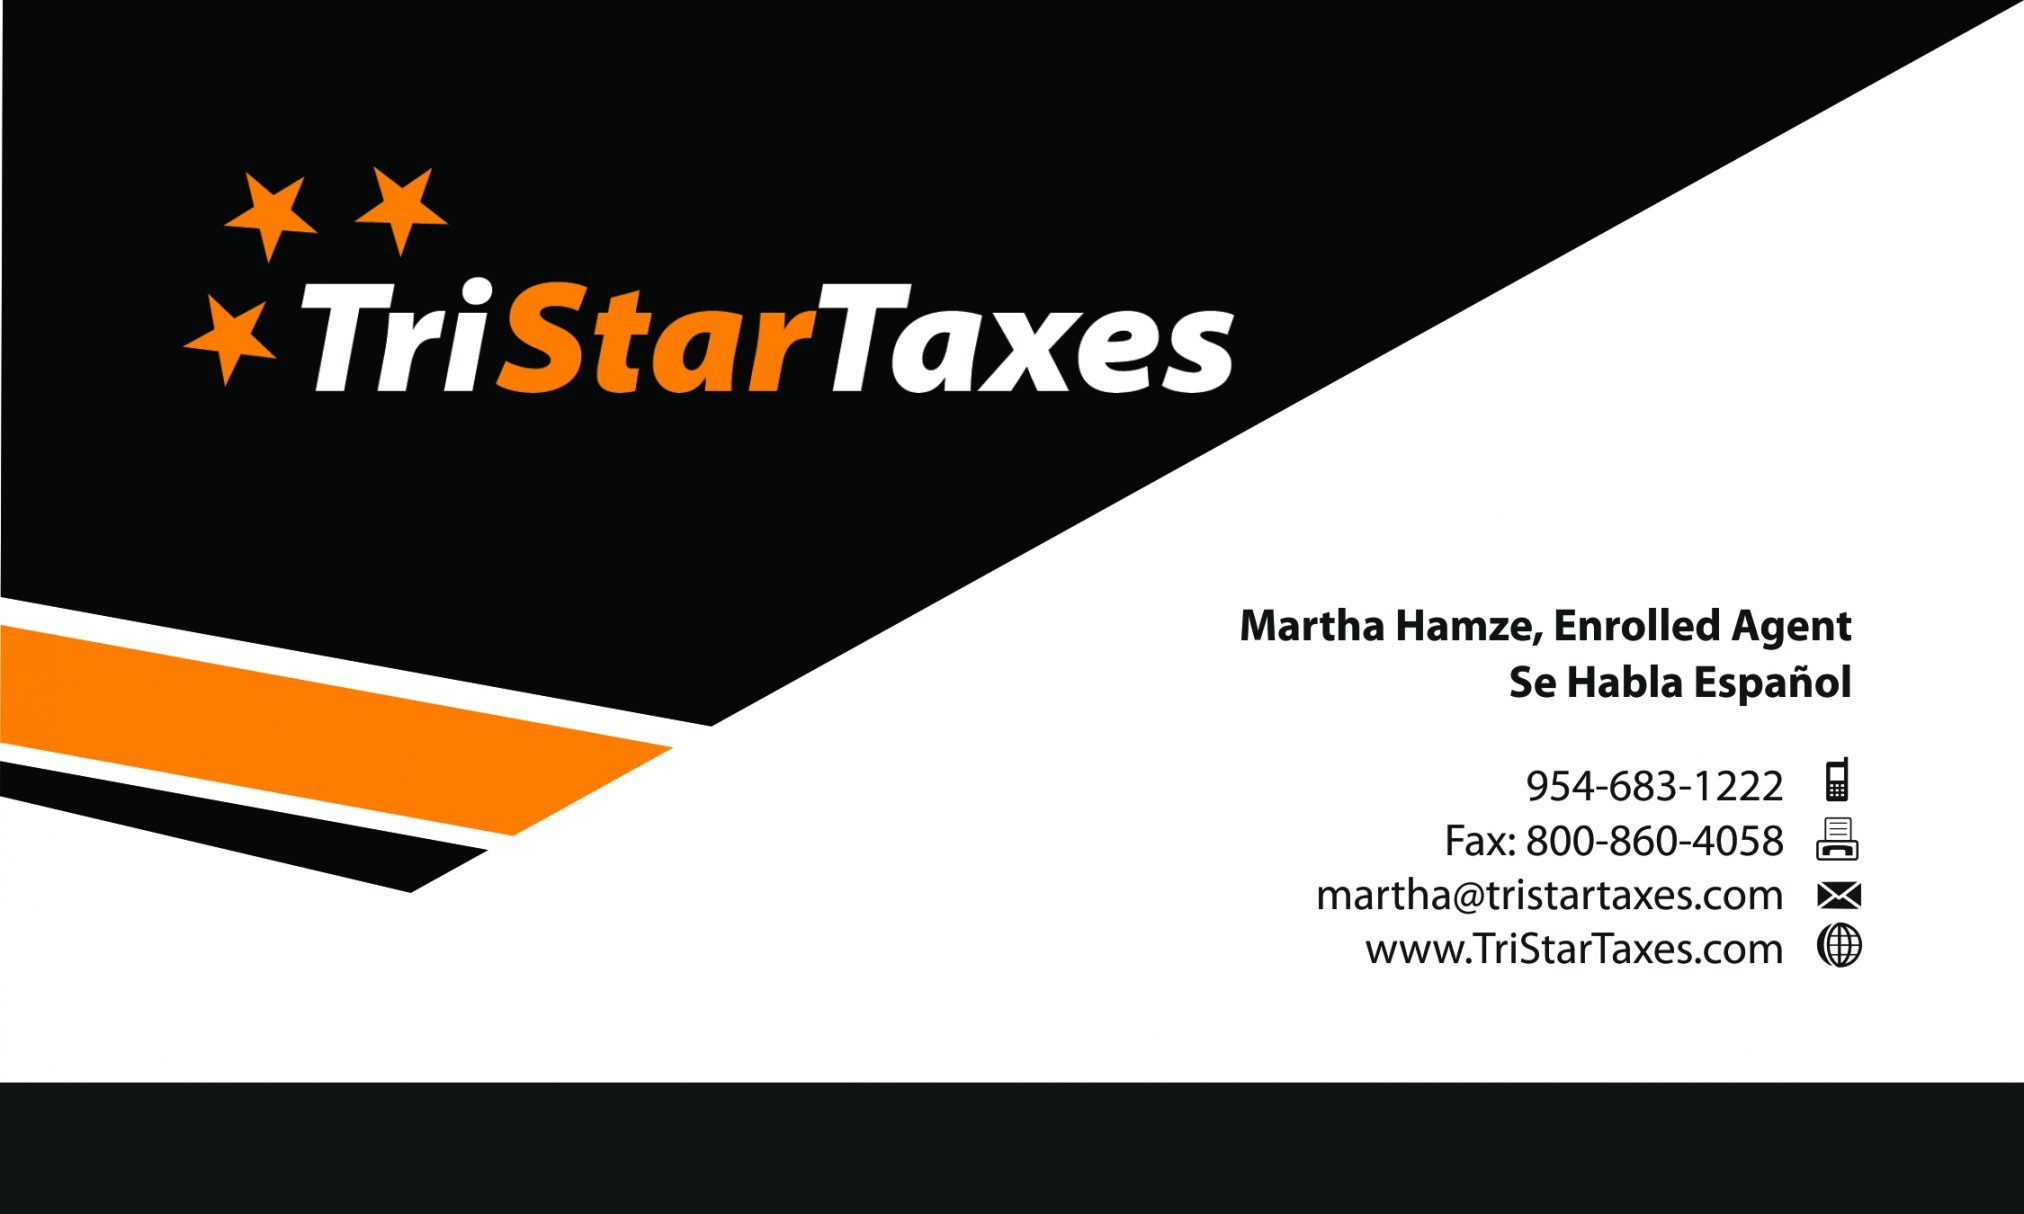 Tri Star Taxes | Tax return preparation and IRS Representation